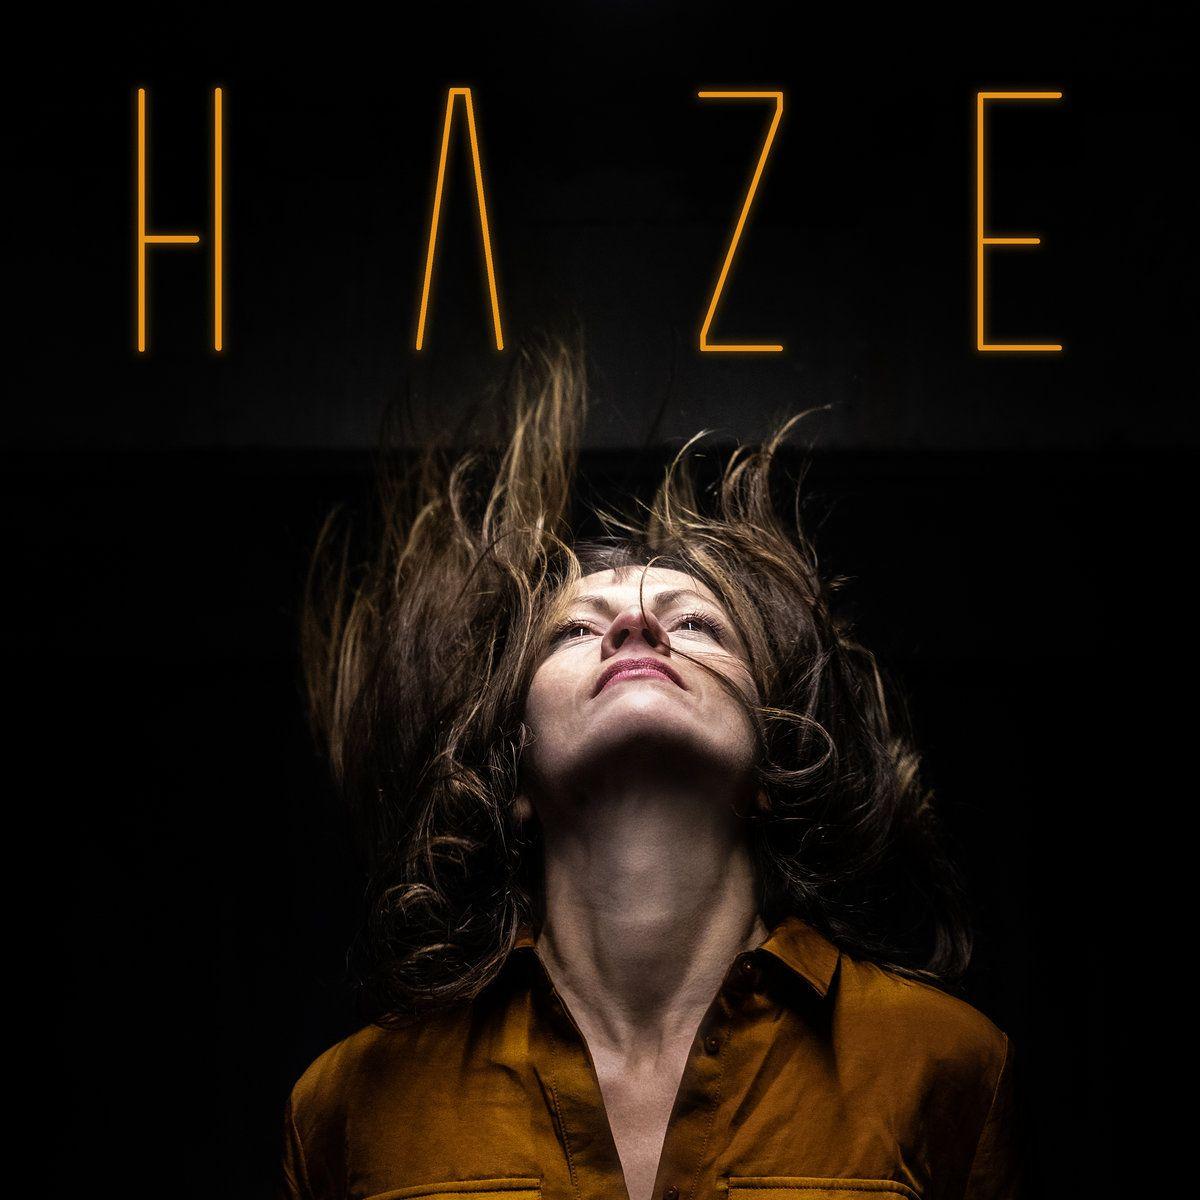 Haze - Fool The World